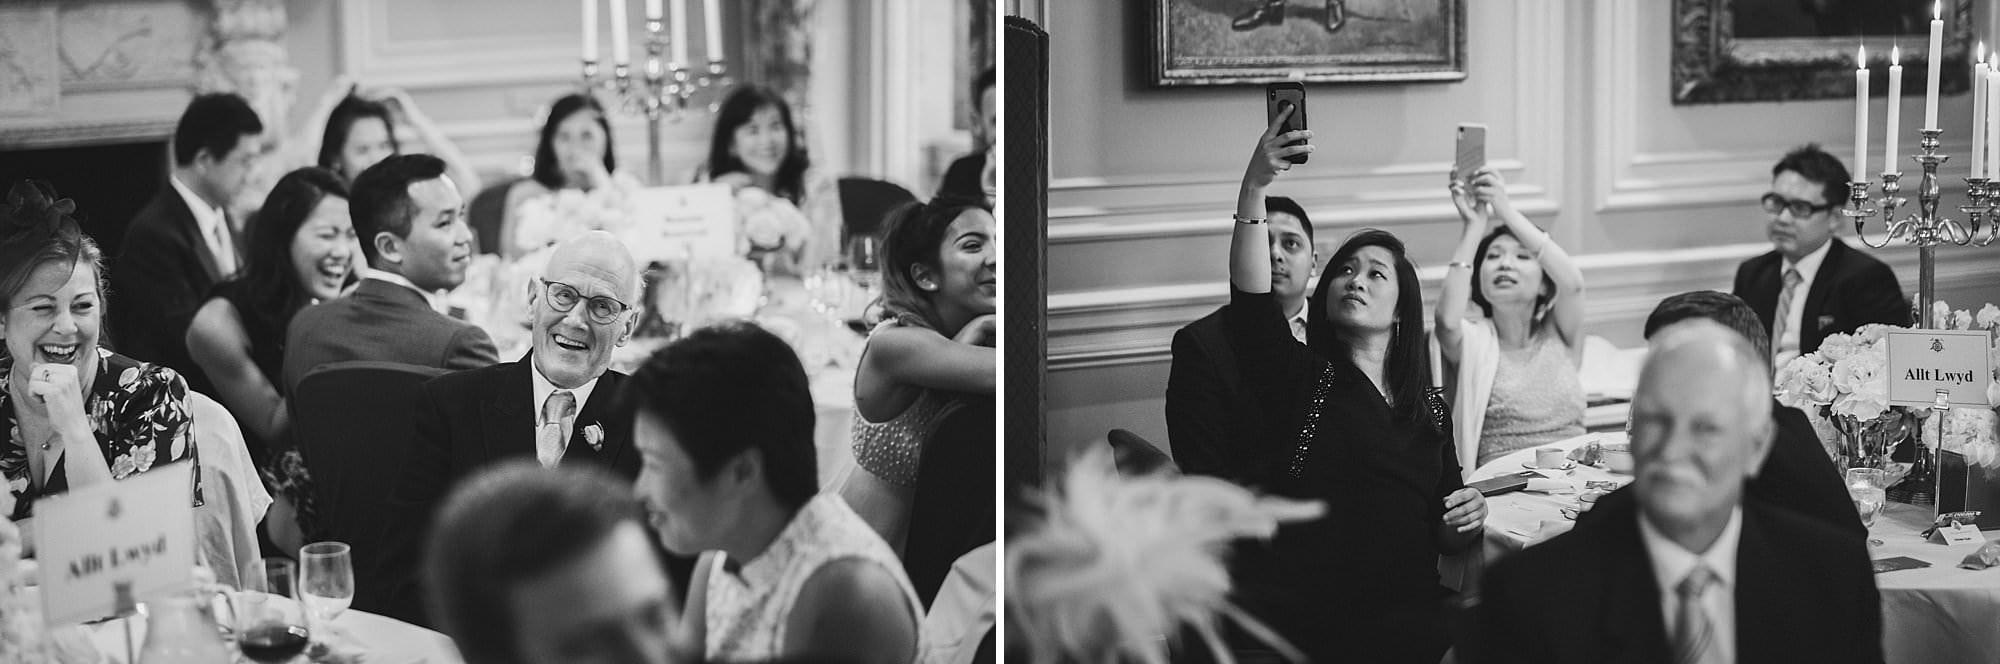 london wedding photographer cavalry guards club 092 - Charissa + Charles   Cavalry & Guards Club Wedding Photography